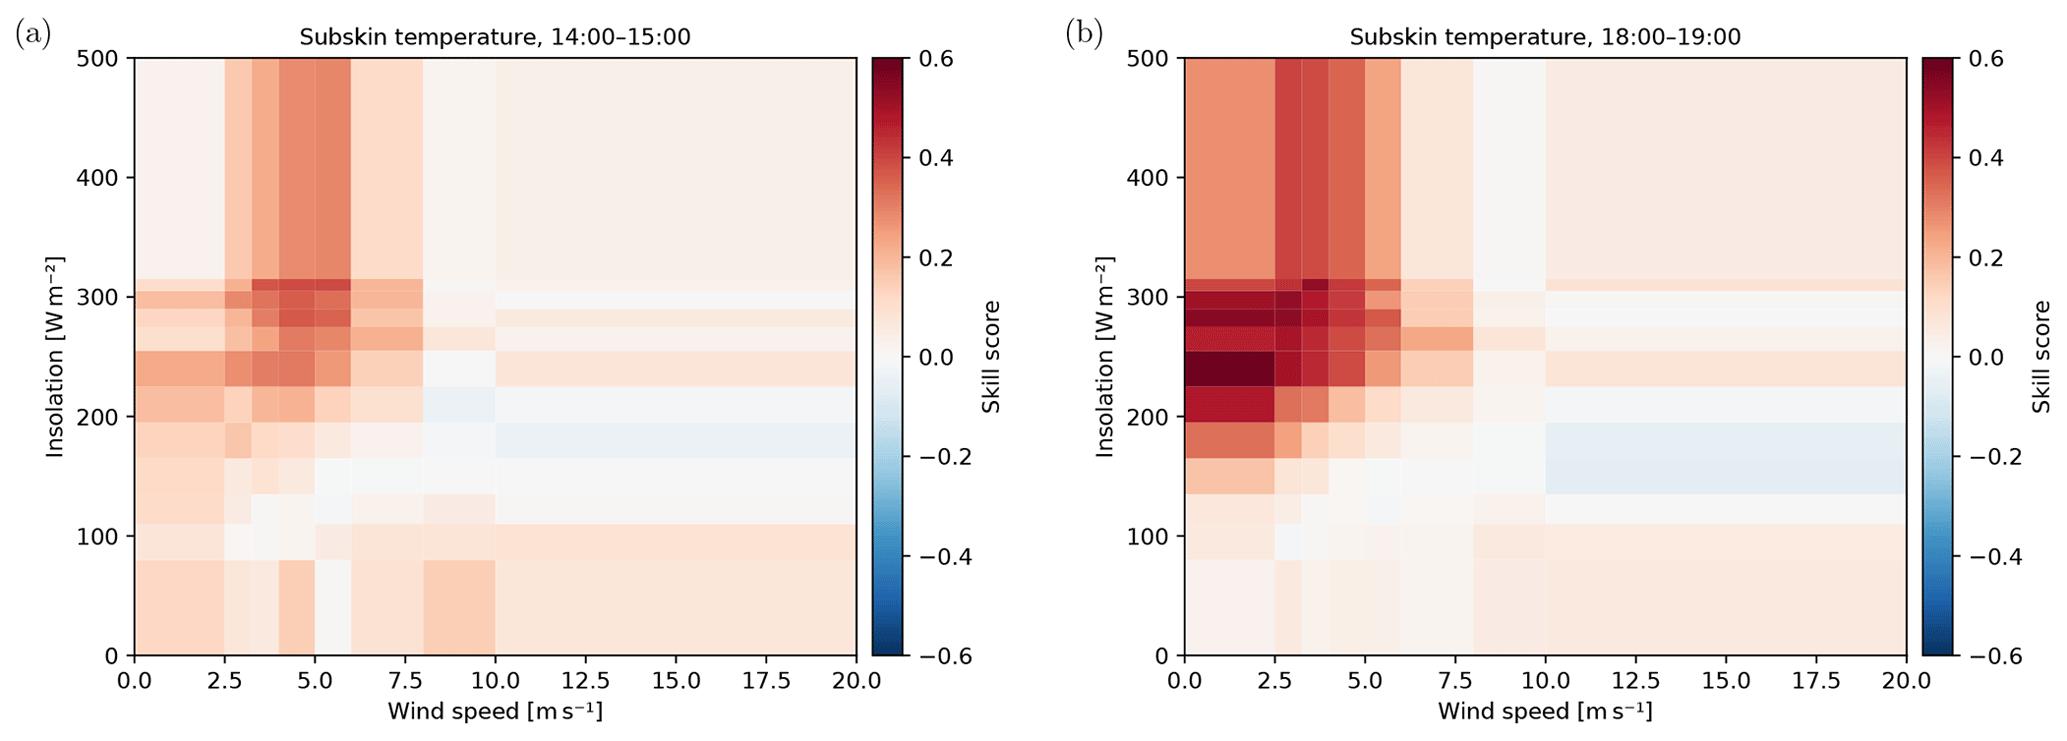 OS - Using canonical correlation analysis to produce